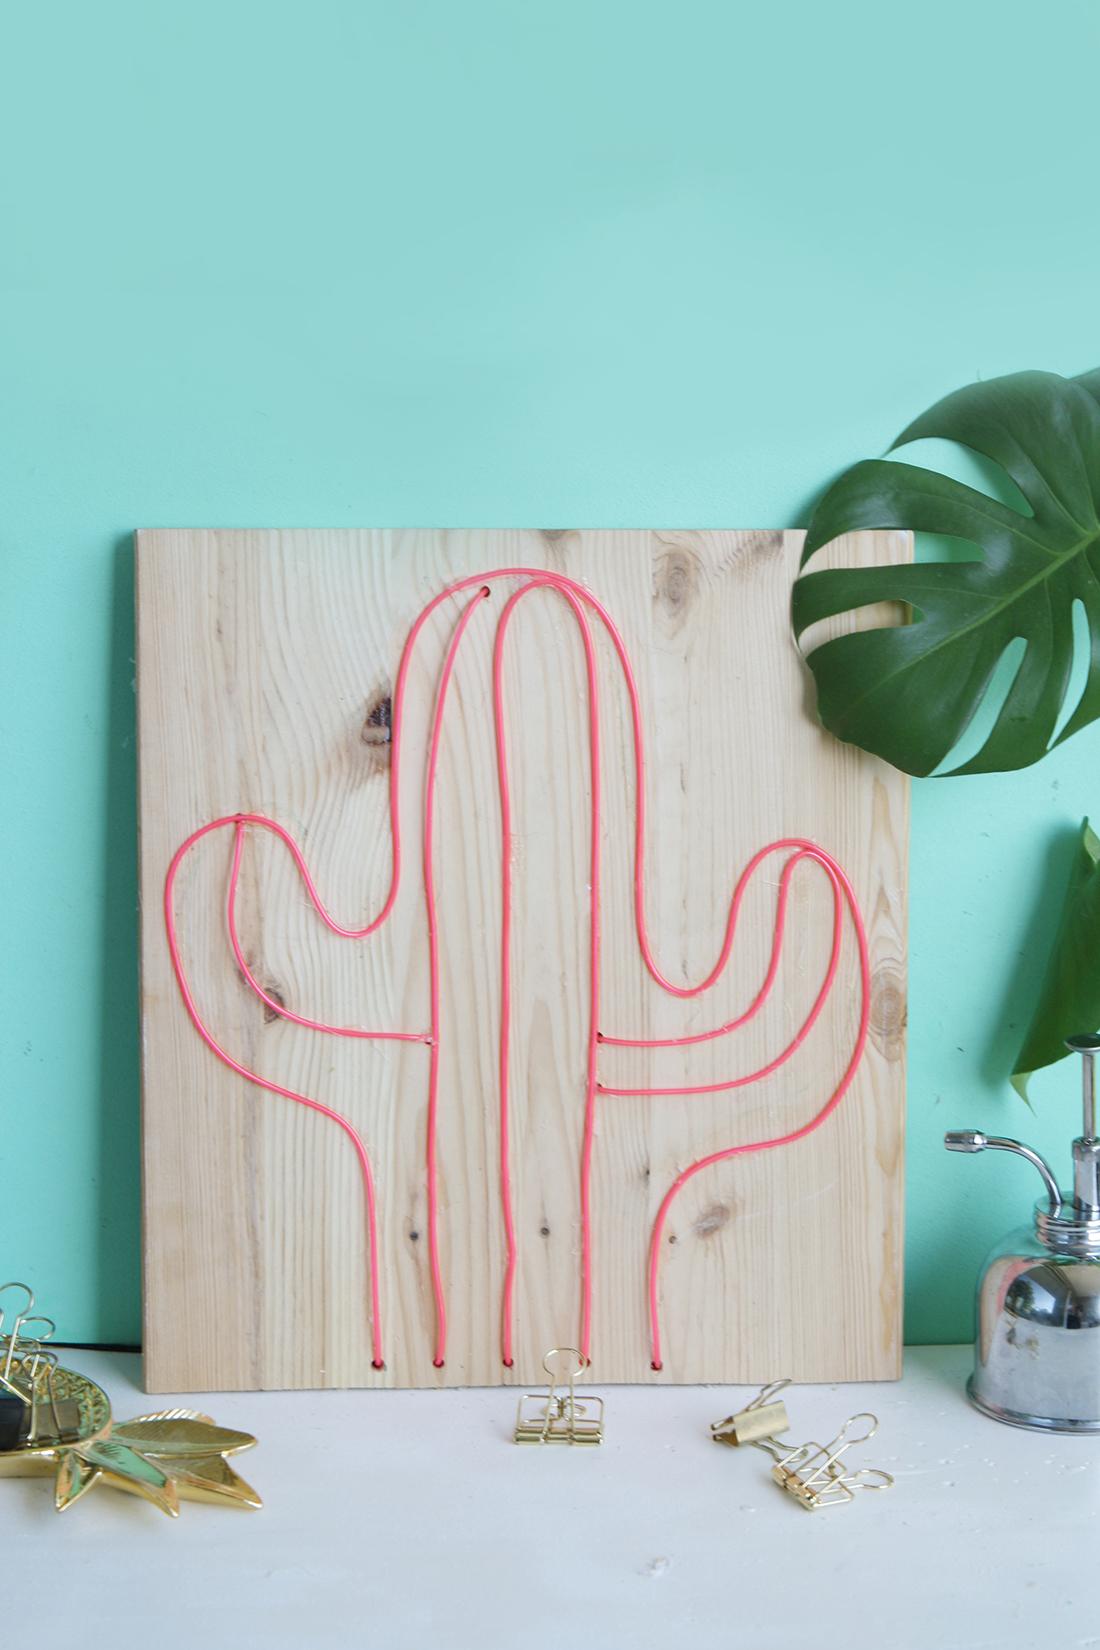 DIY Kaktus Neonschild selbermachen